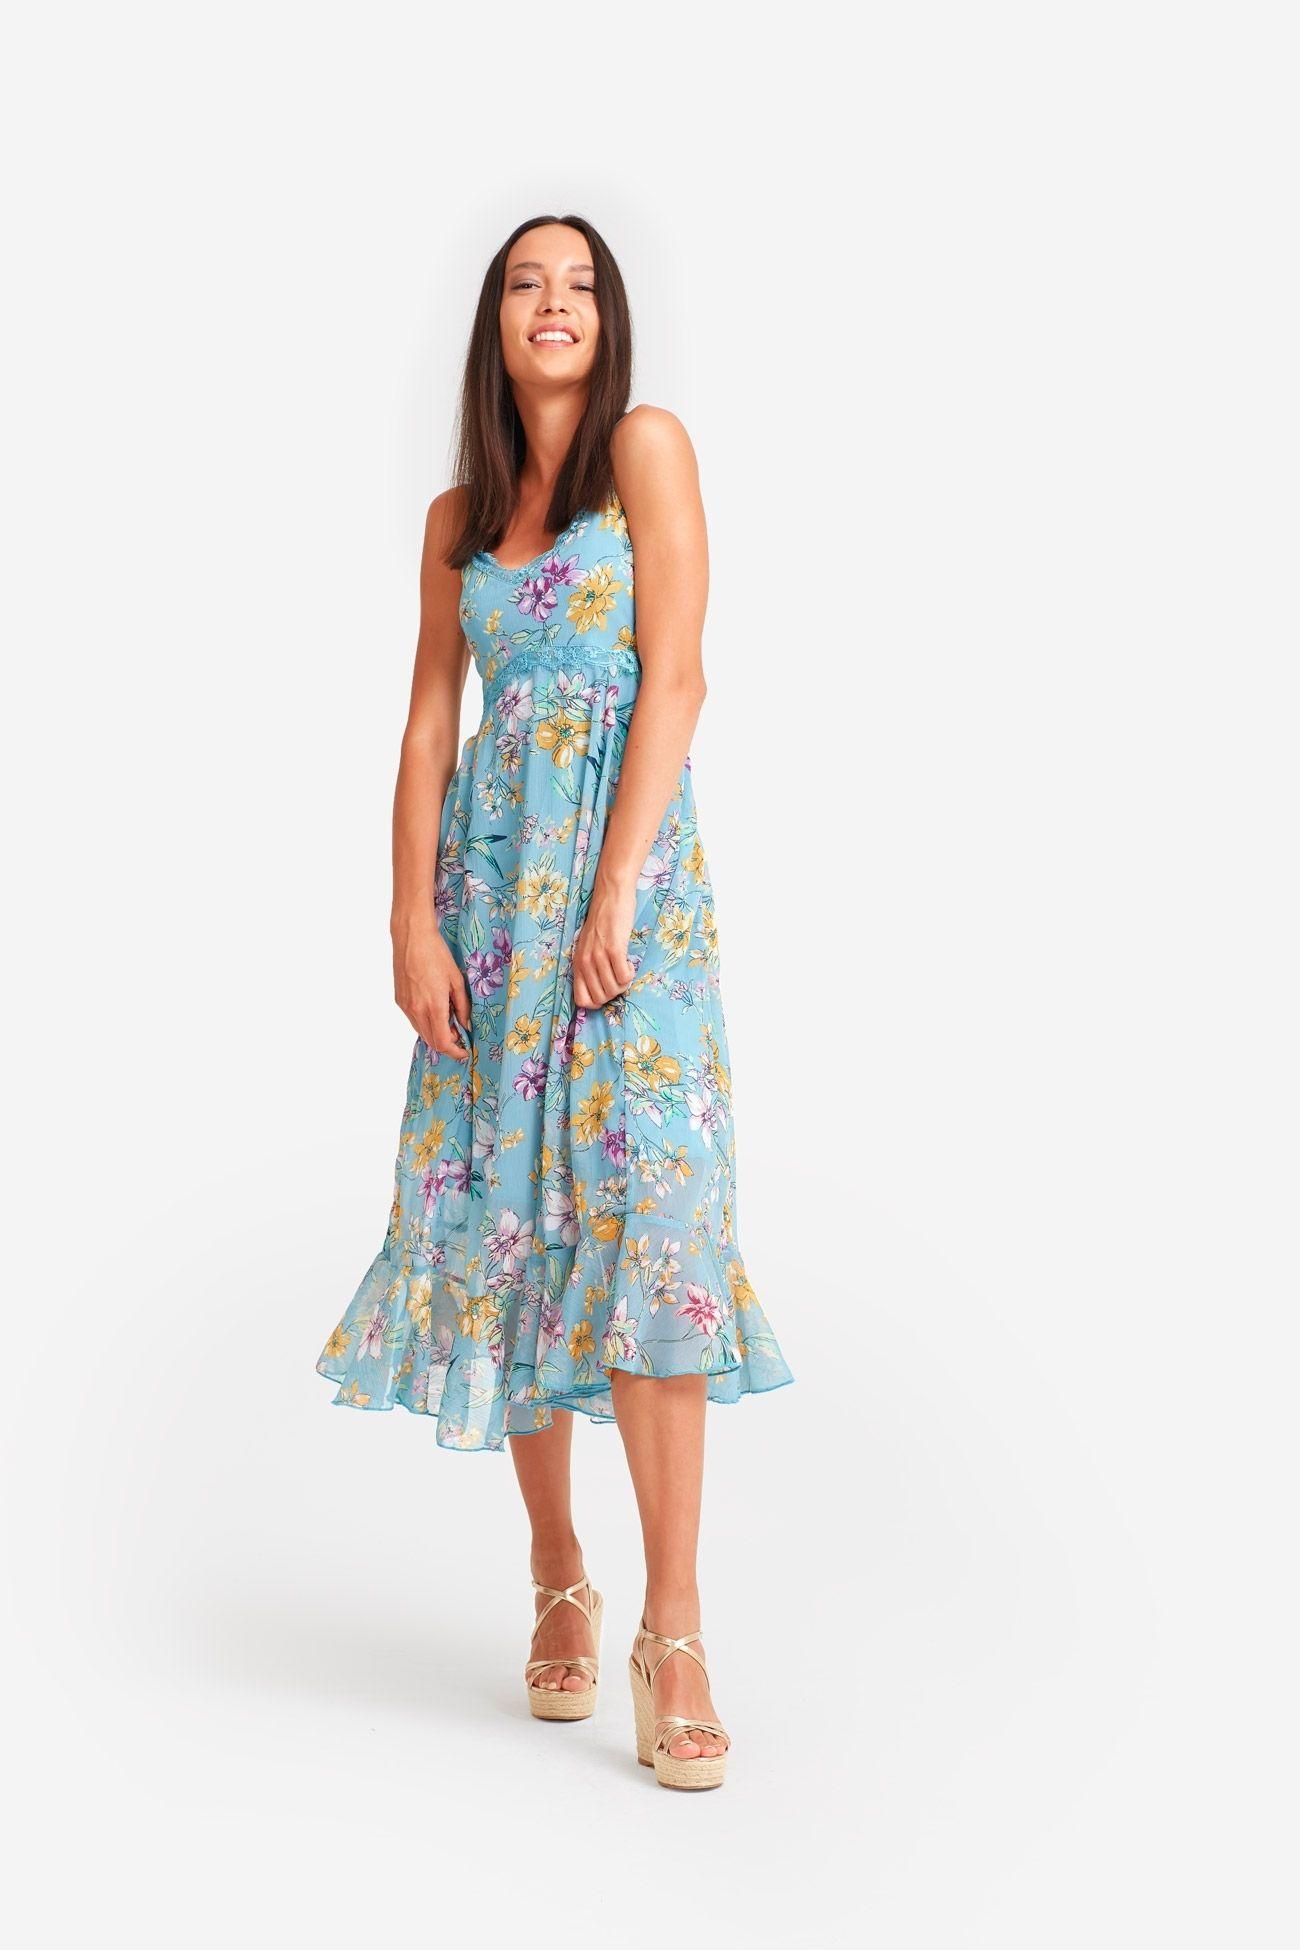 Encuentro vestidos de mujer [PUNIQRANDLINE-(au-dating-names.txt) 47